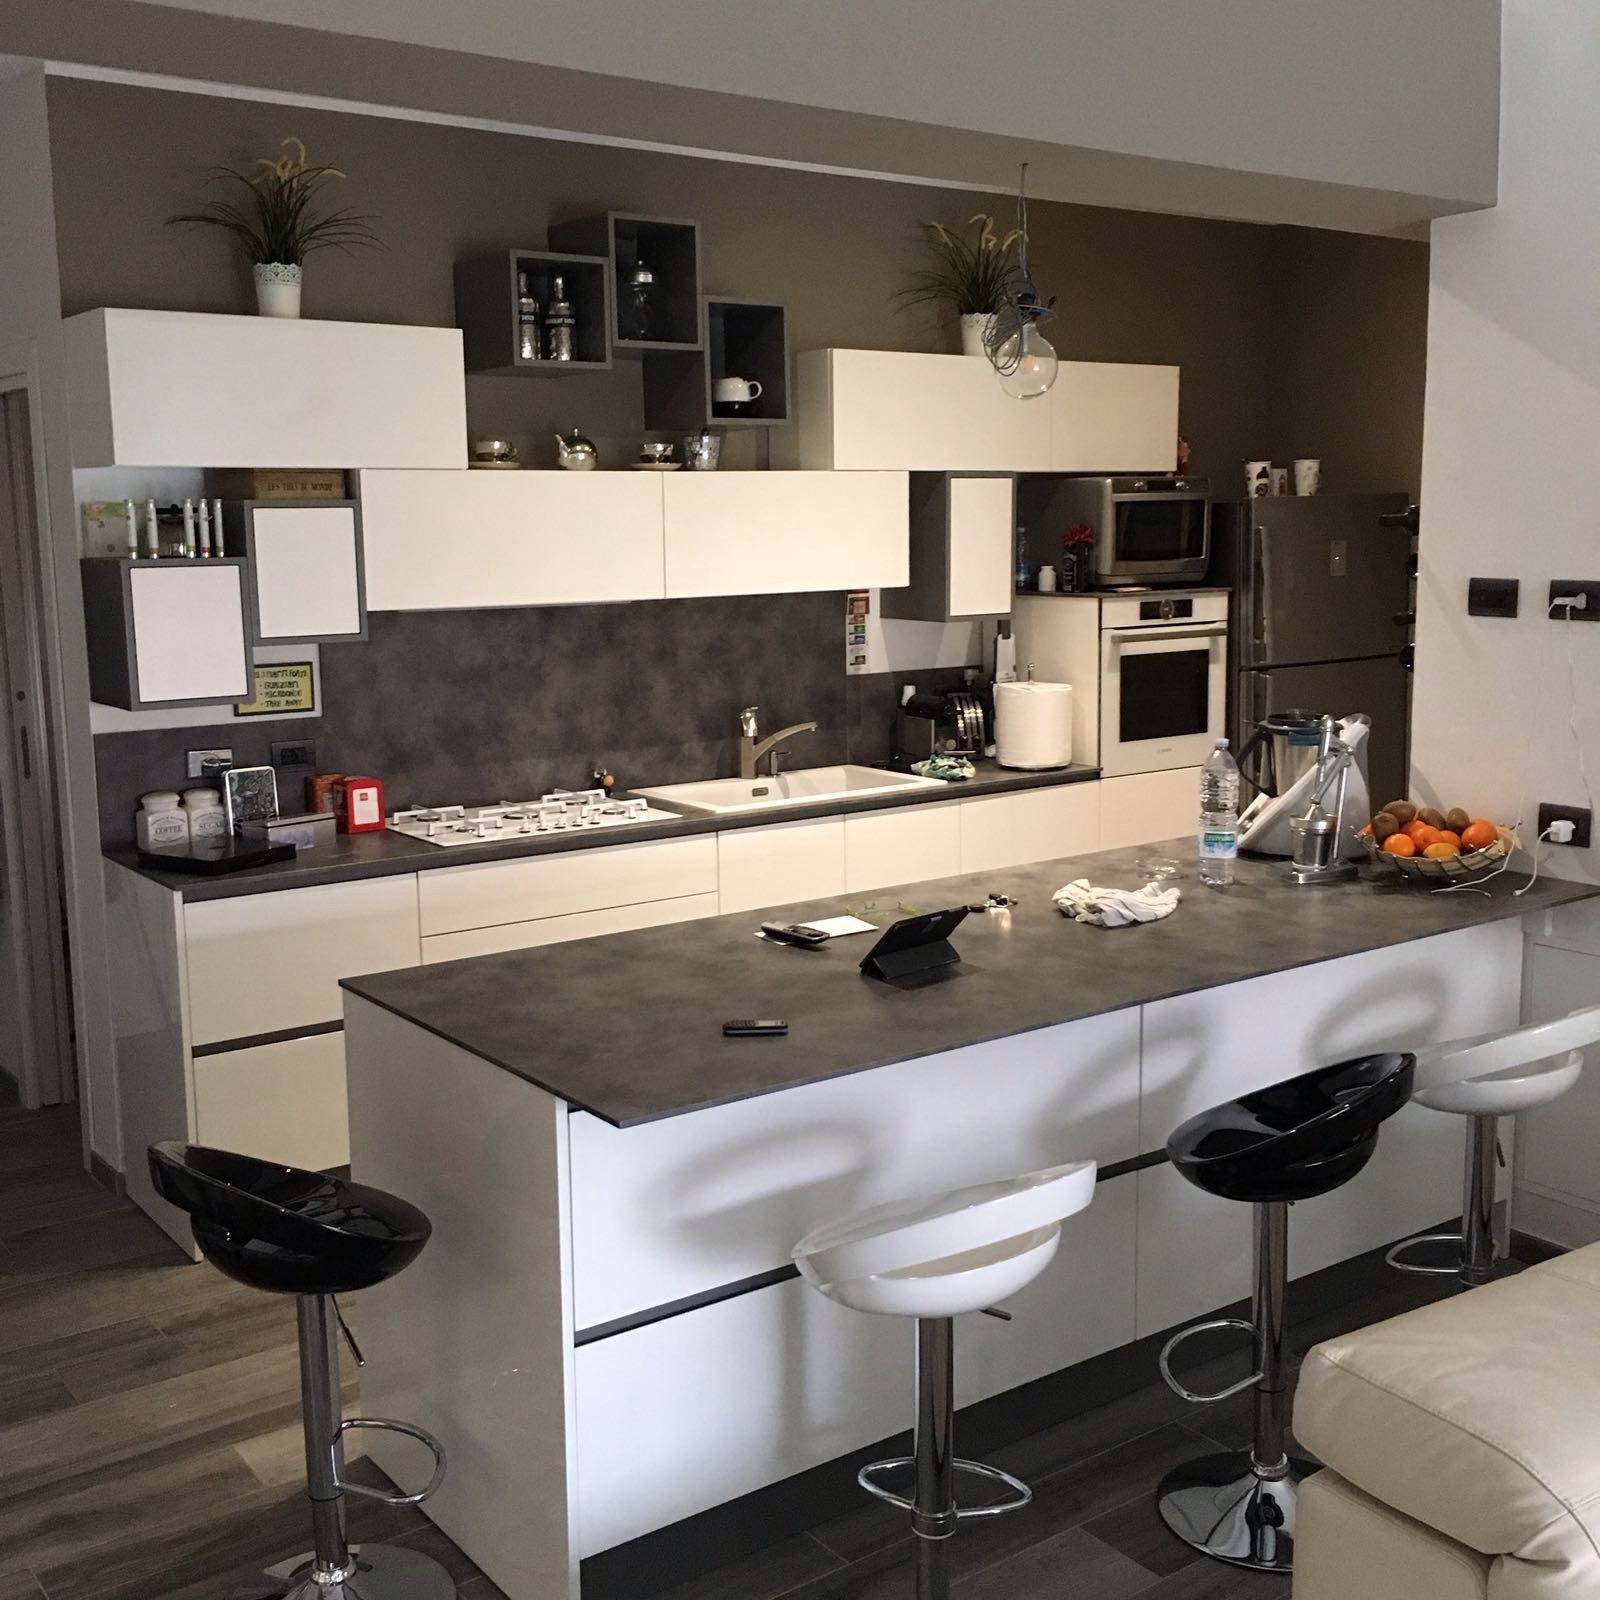 Cucina e living minimal moderno bianco e antracite – Basile